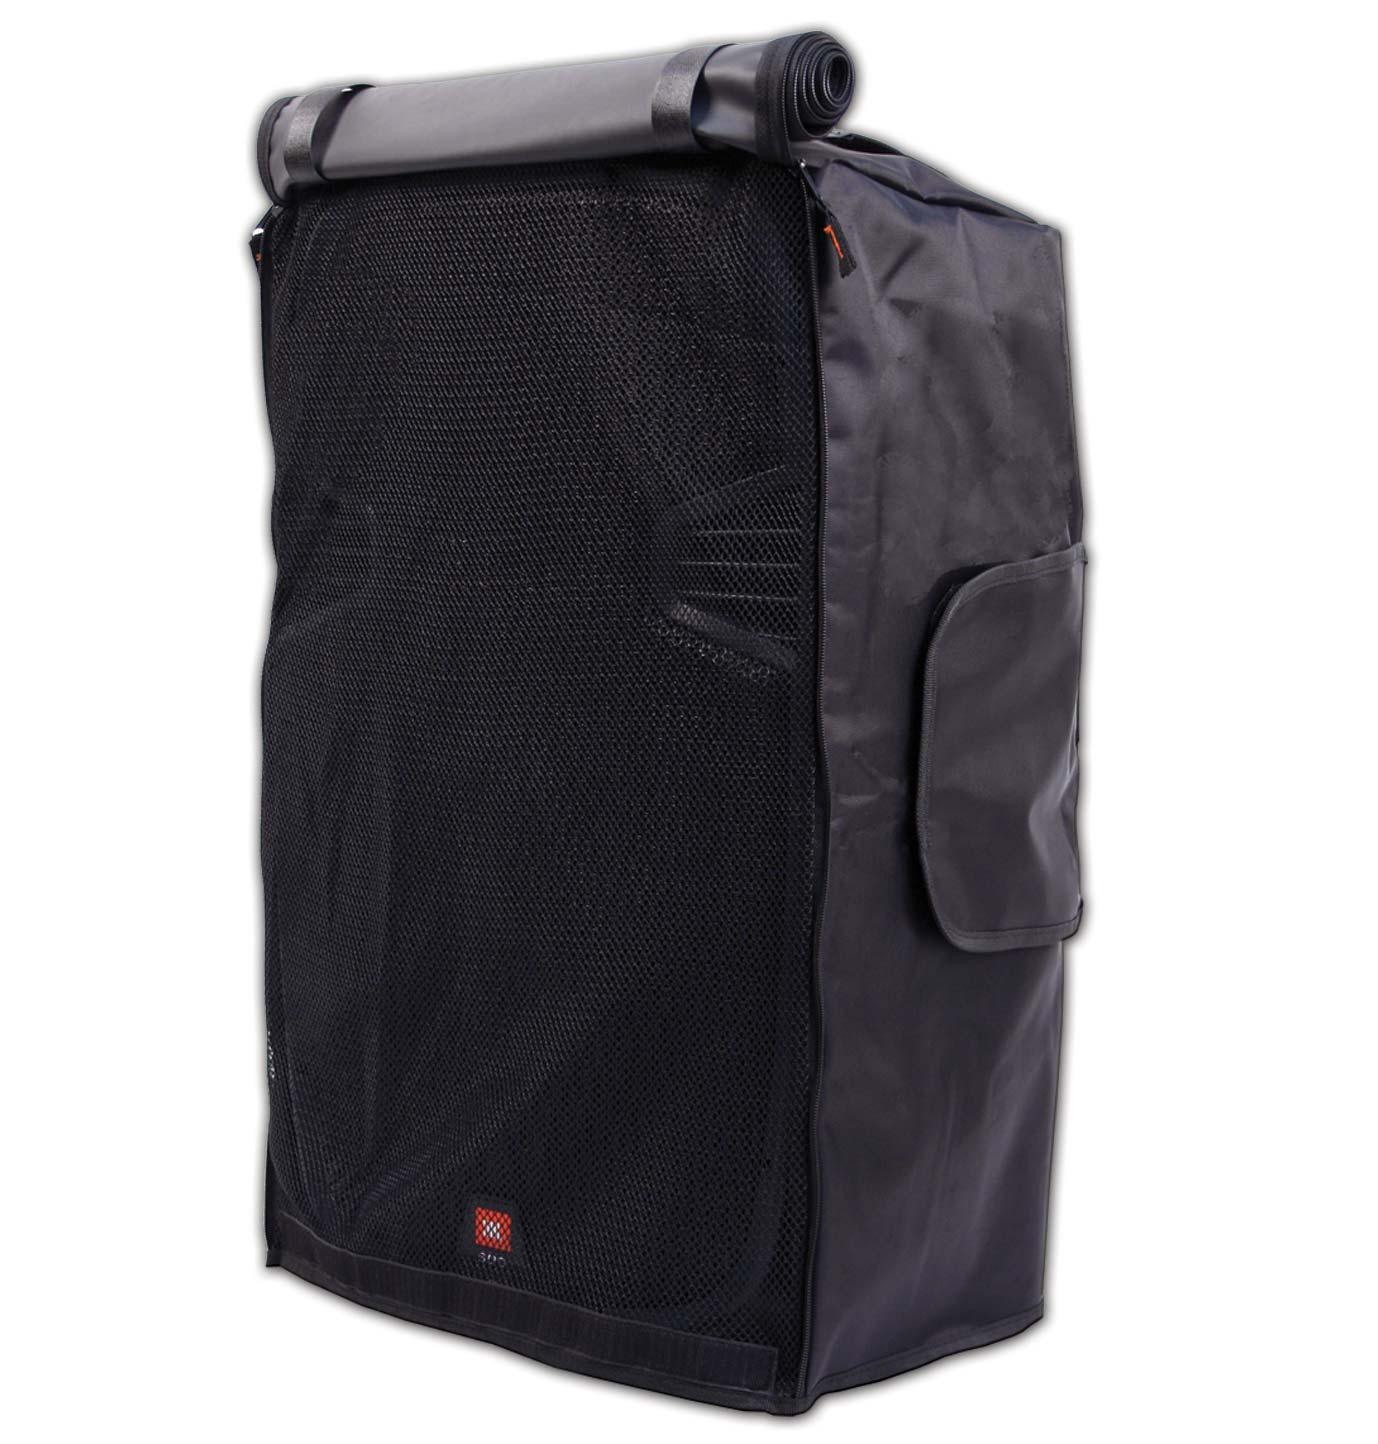 jbl bags eon15 cvr 3cx convertible loudspeaker cover for eon15 agiprodj. Black Bedroom Furniture Sets. Home Design Ideas